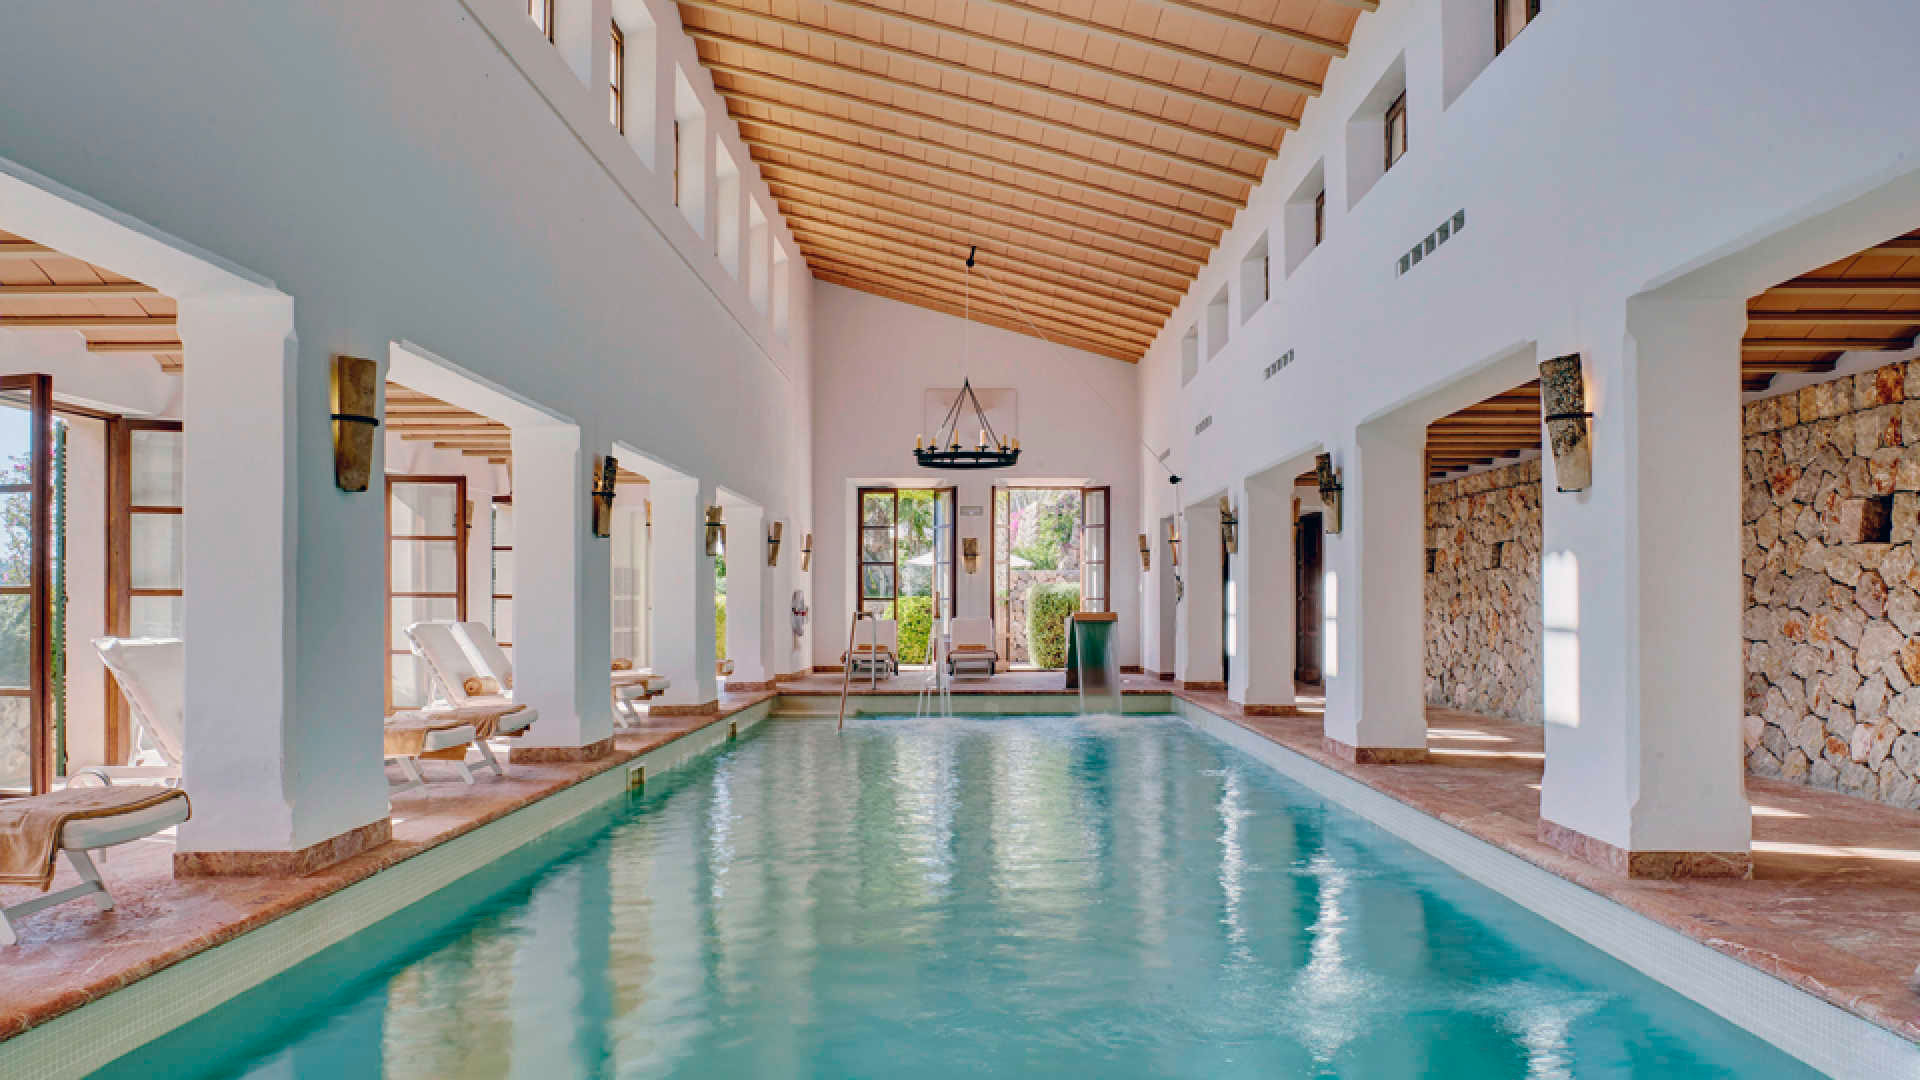 Interior del Hotel Belmond La Residencia en Mallorca